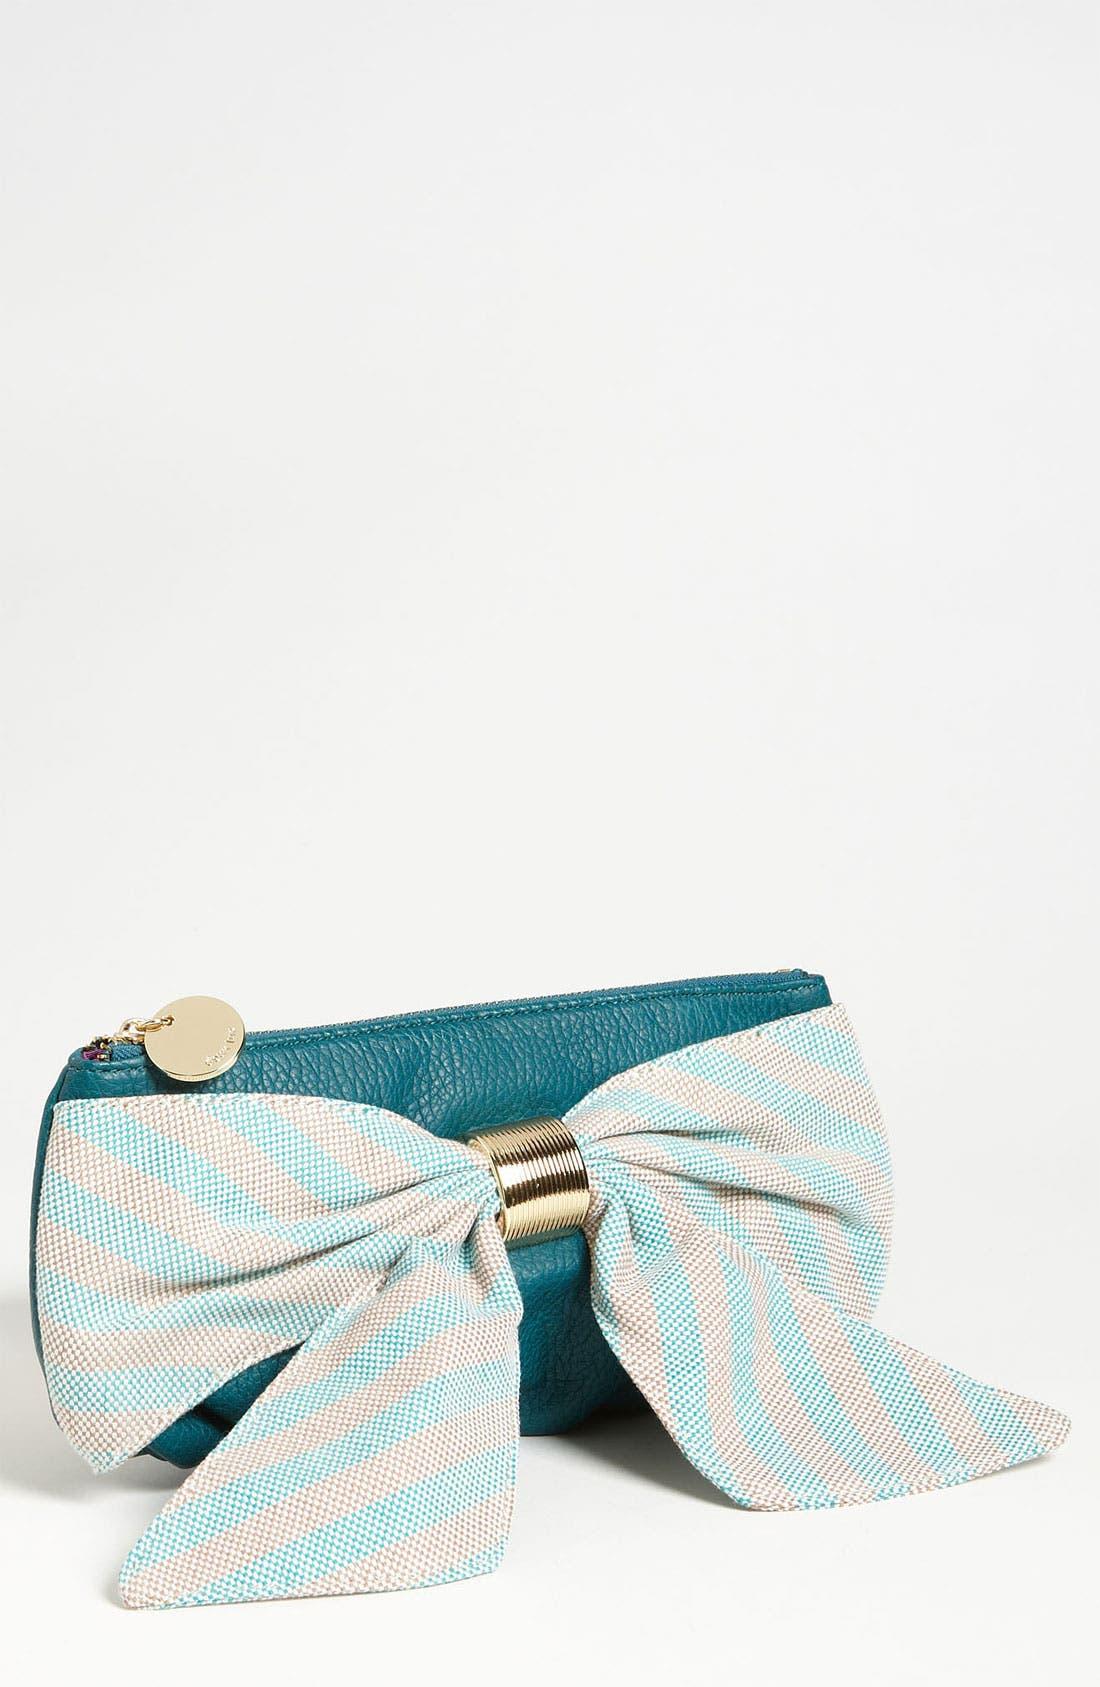 Main Image - Deux Lux 'Heidi Girl' Stripe Box Clutch